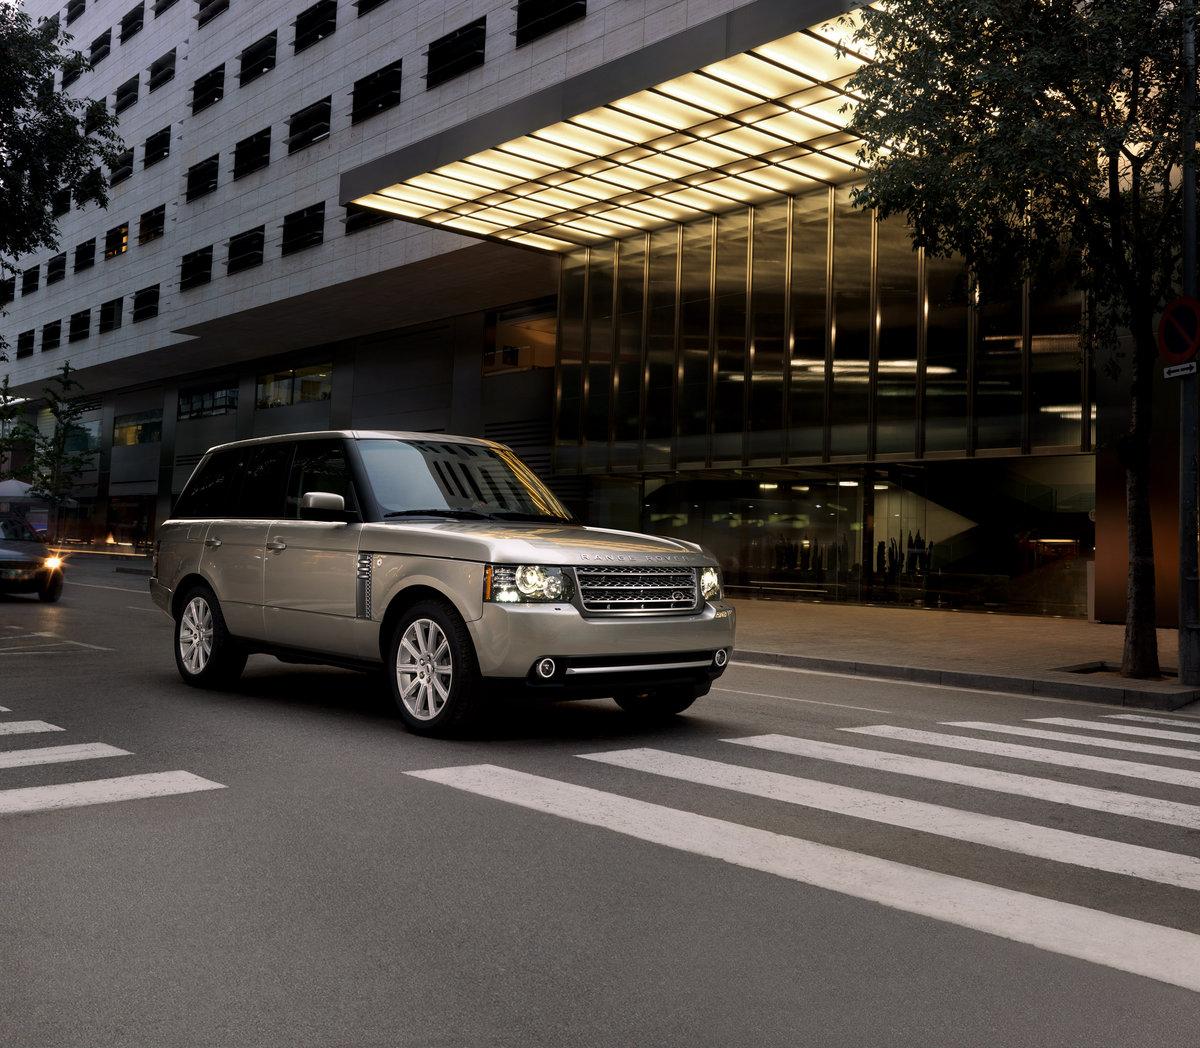 New York 2009: 2010 Land Rover Range Rover